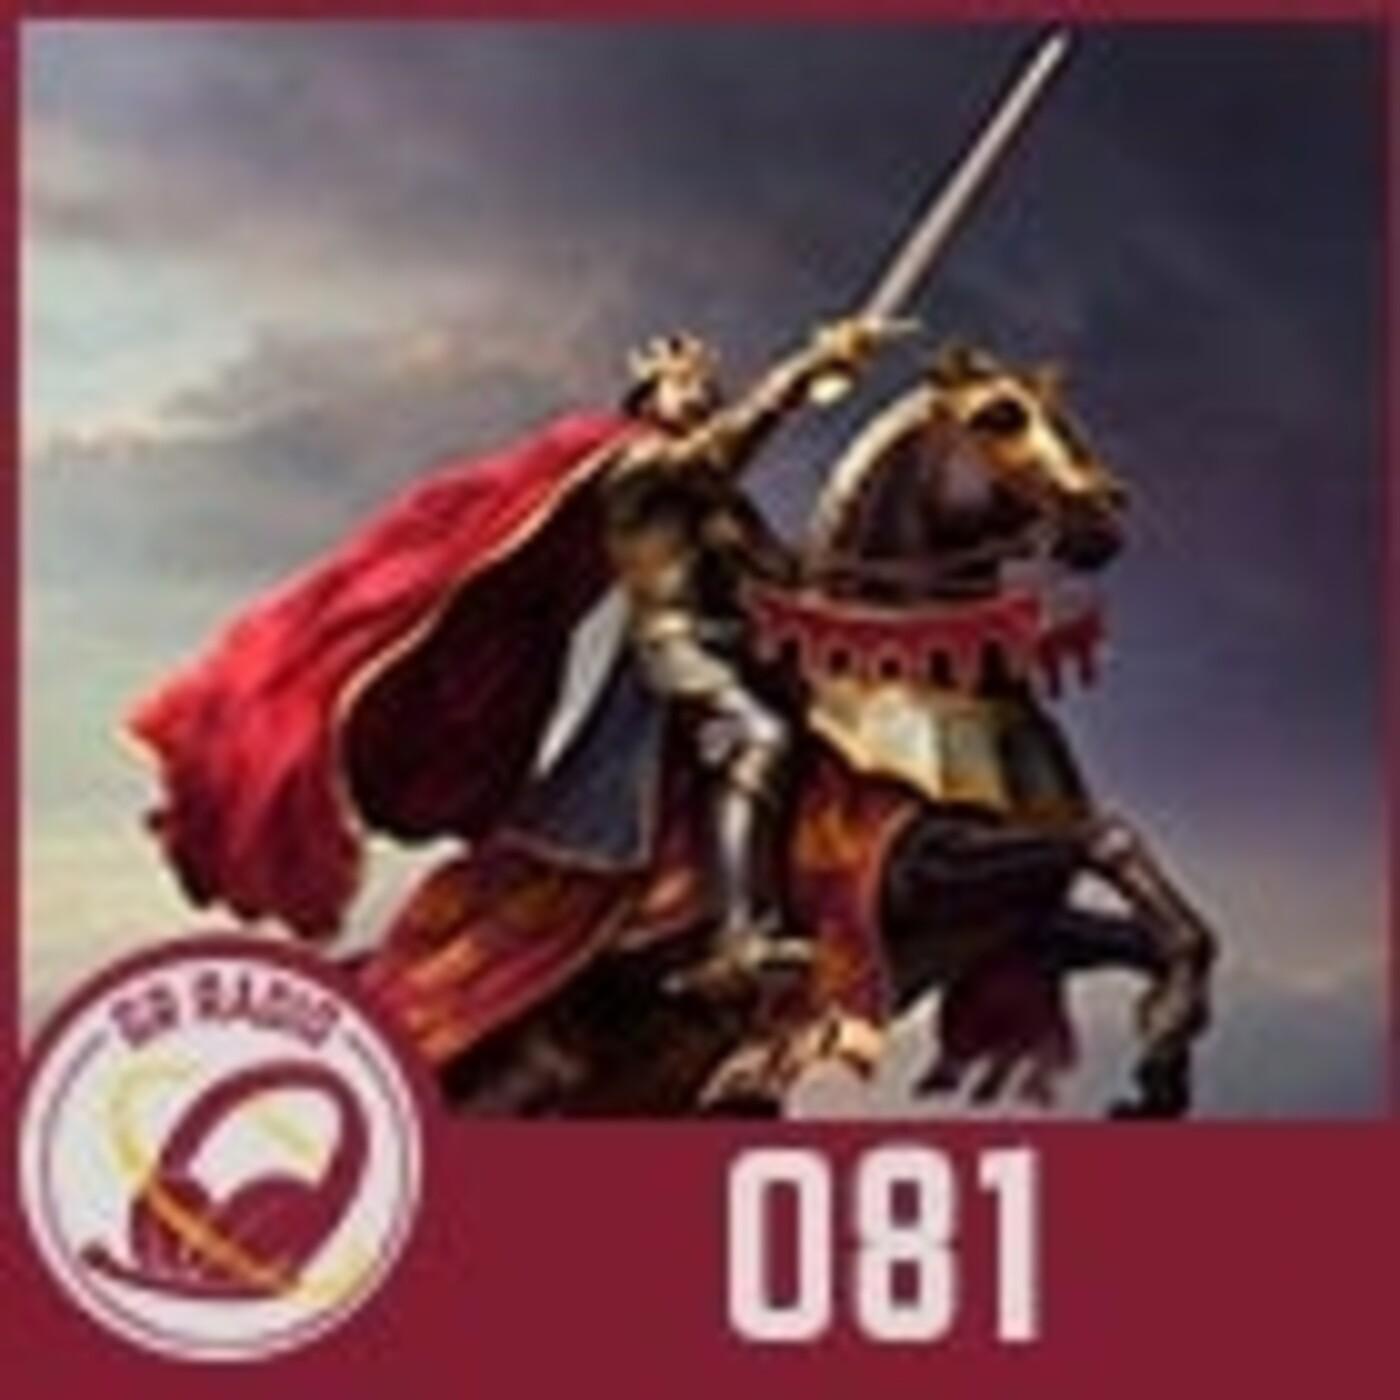 GR (081) Novedades HORIZON FORBIDDEN WEST | CALL OF BATTLEFIELD | KING'S BOUNTY II | E3 Fechas y 2K Games | BLIZZA